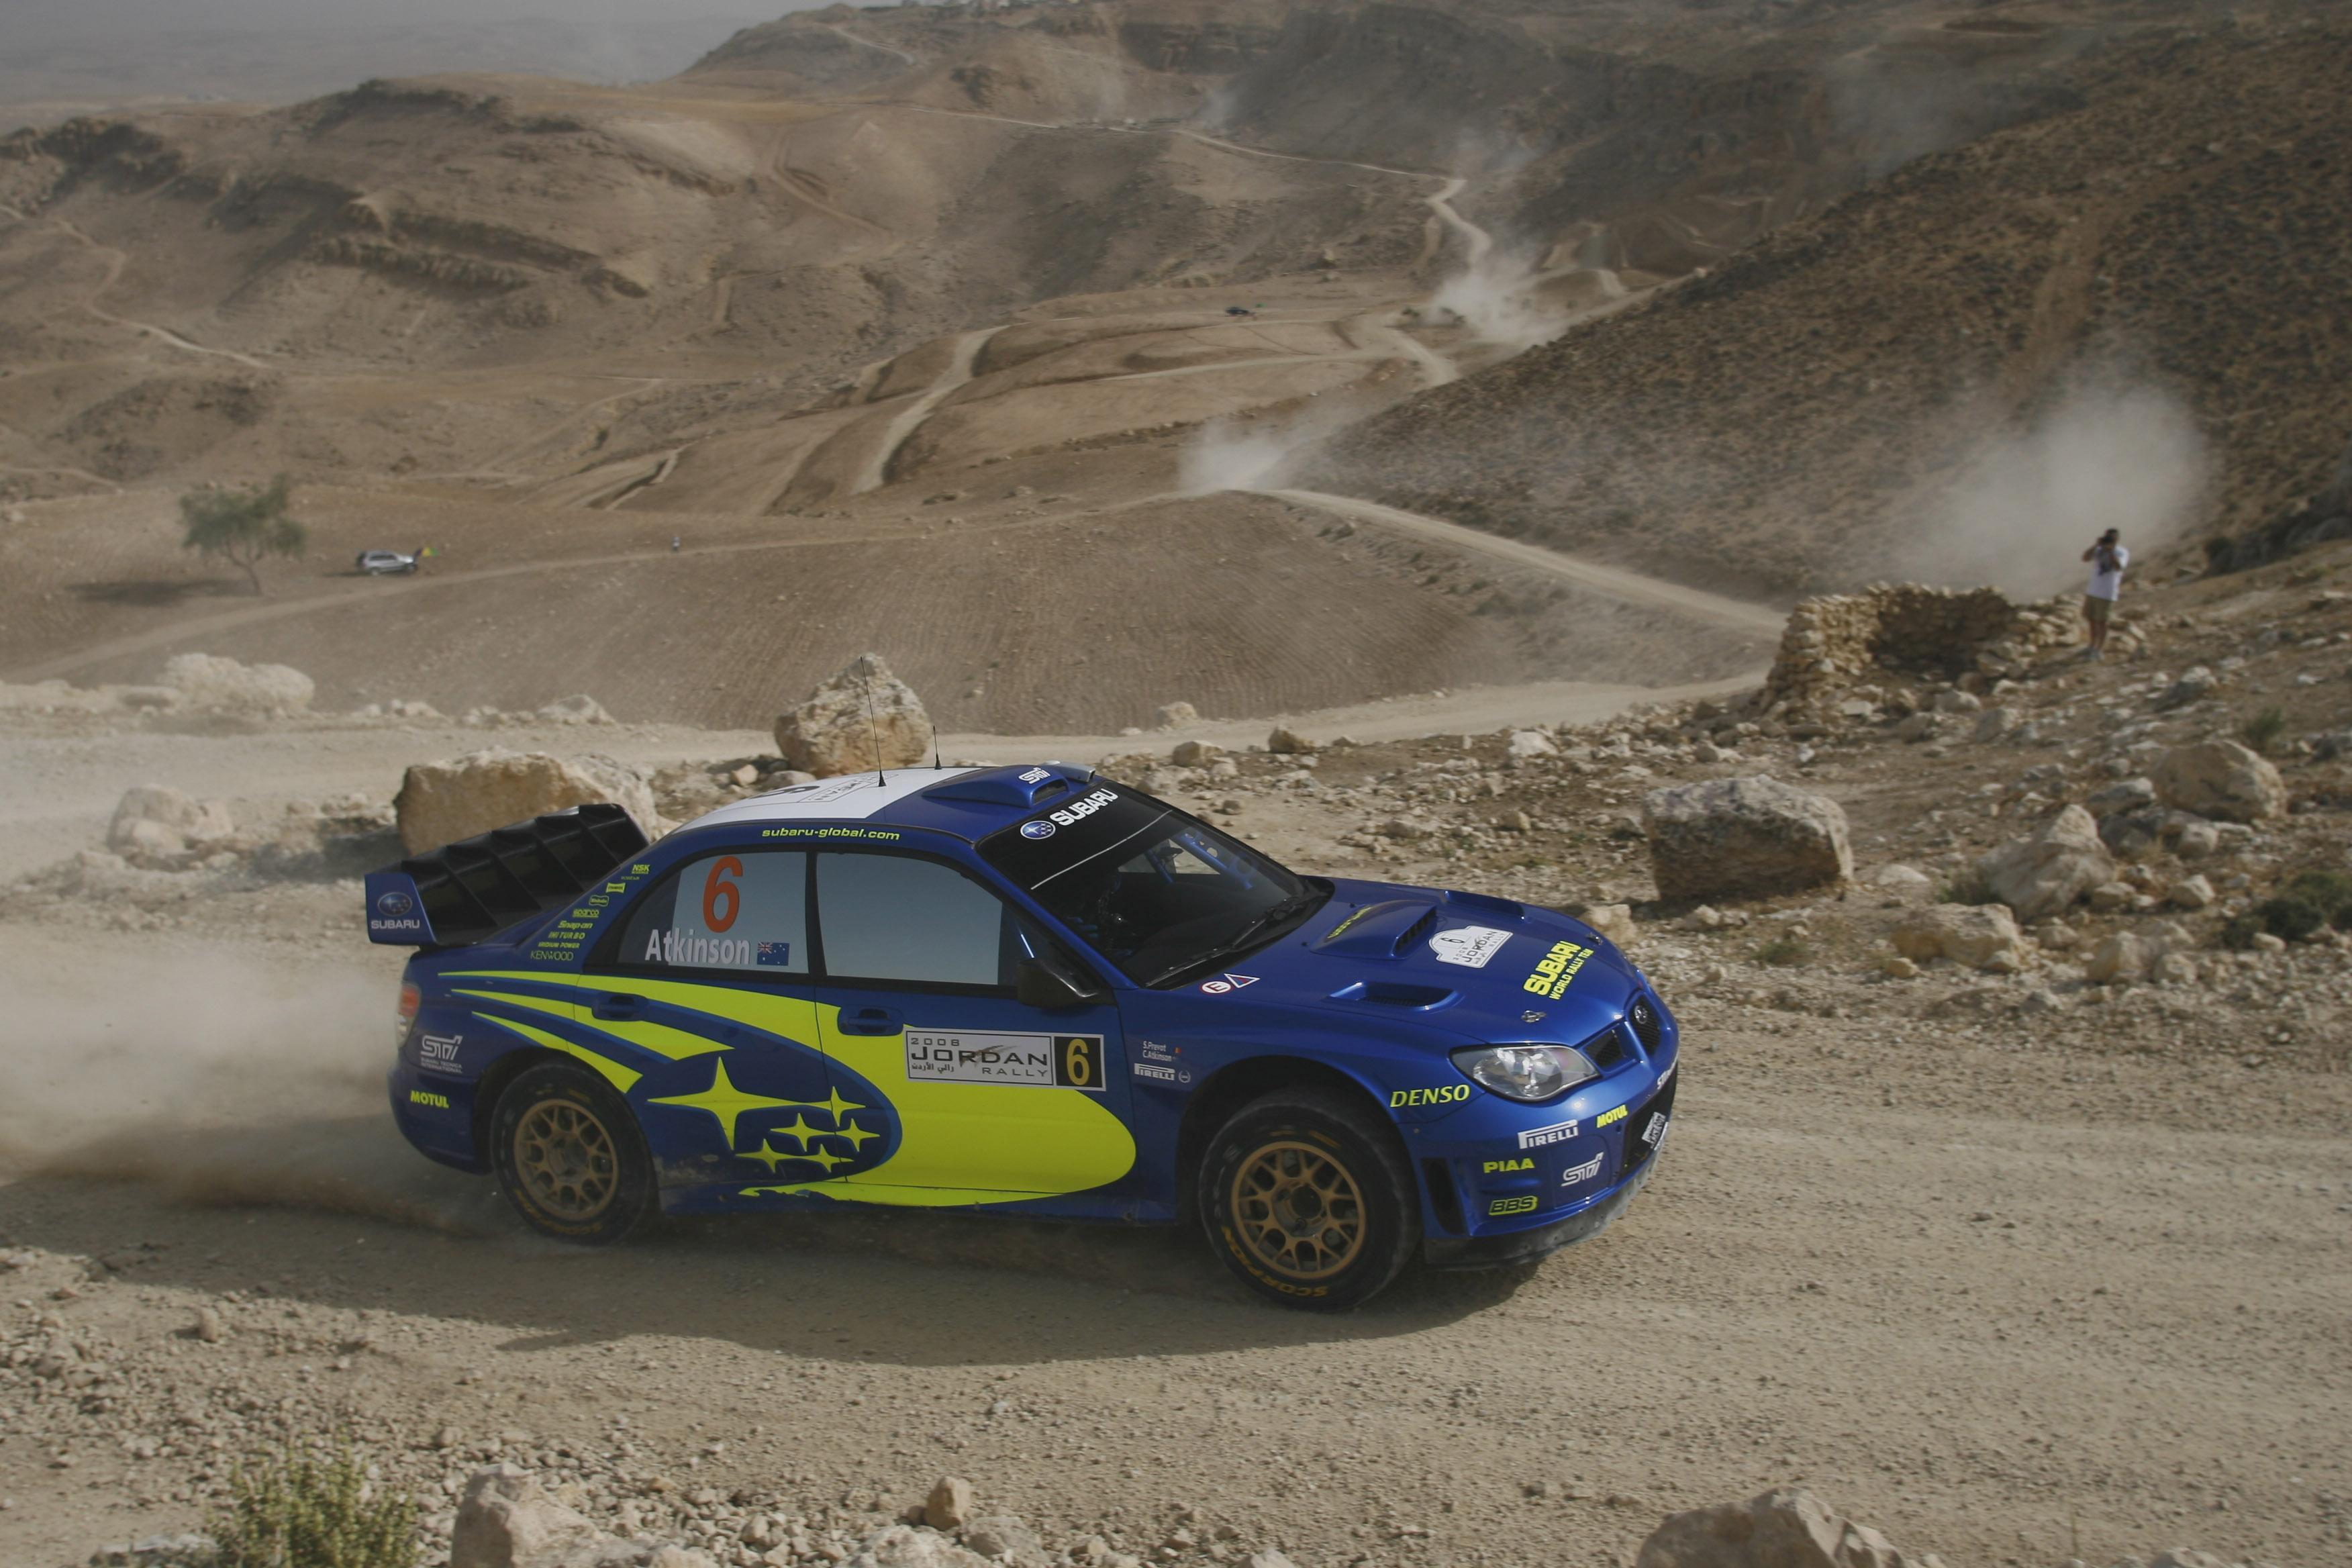 Dust, Rally, Subaru Impreza WRC, Racing, Races, Rally Cars, Offroad   Free  Wallpaper / WallpaperJam.com